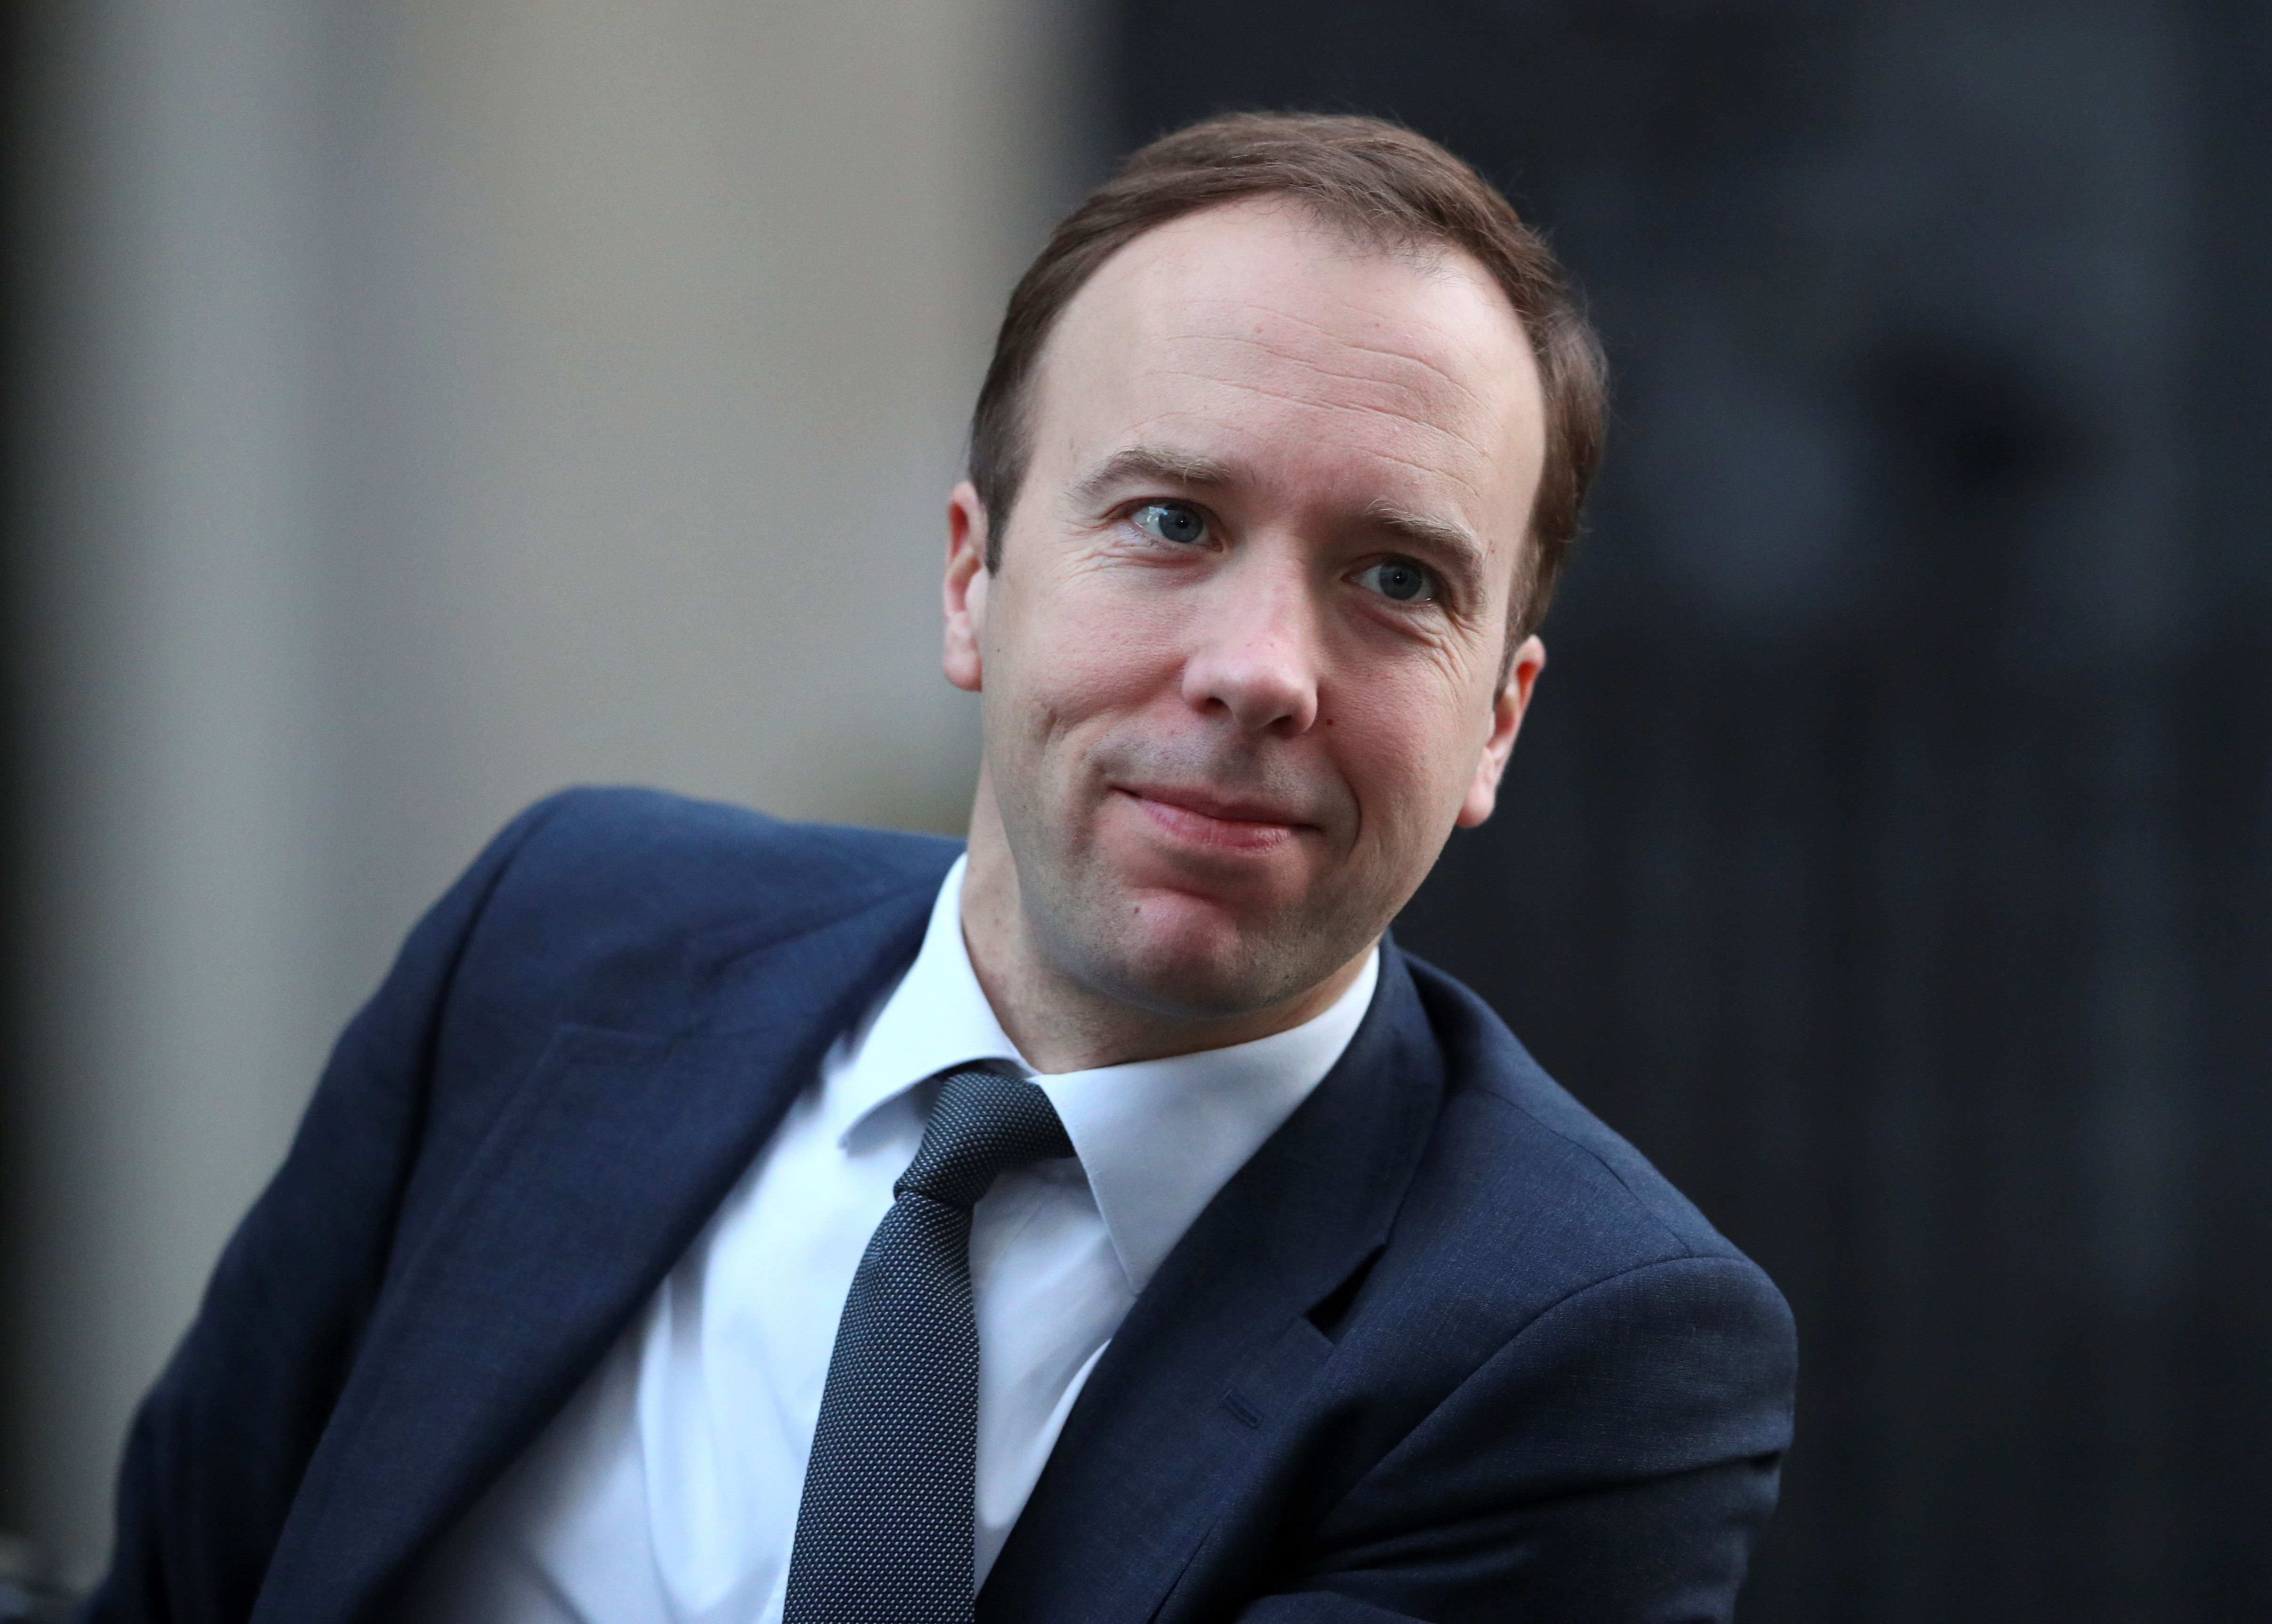 Health secretary Matt Hancock tells how NHS saved his sister's life